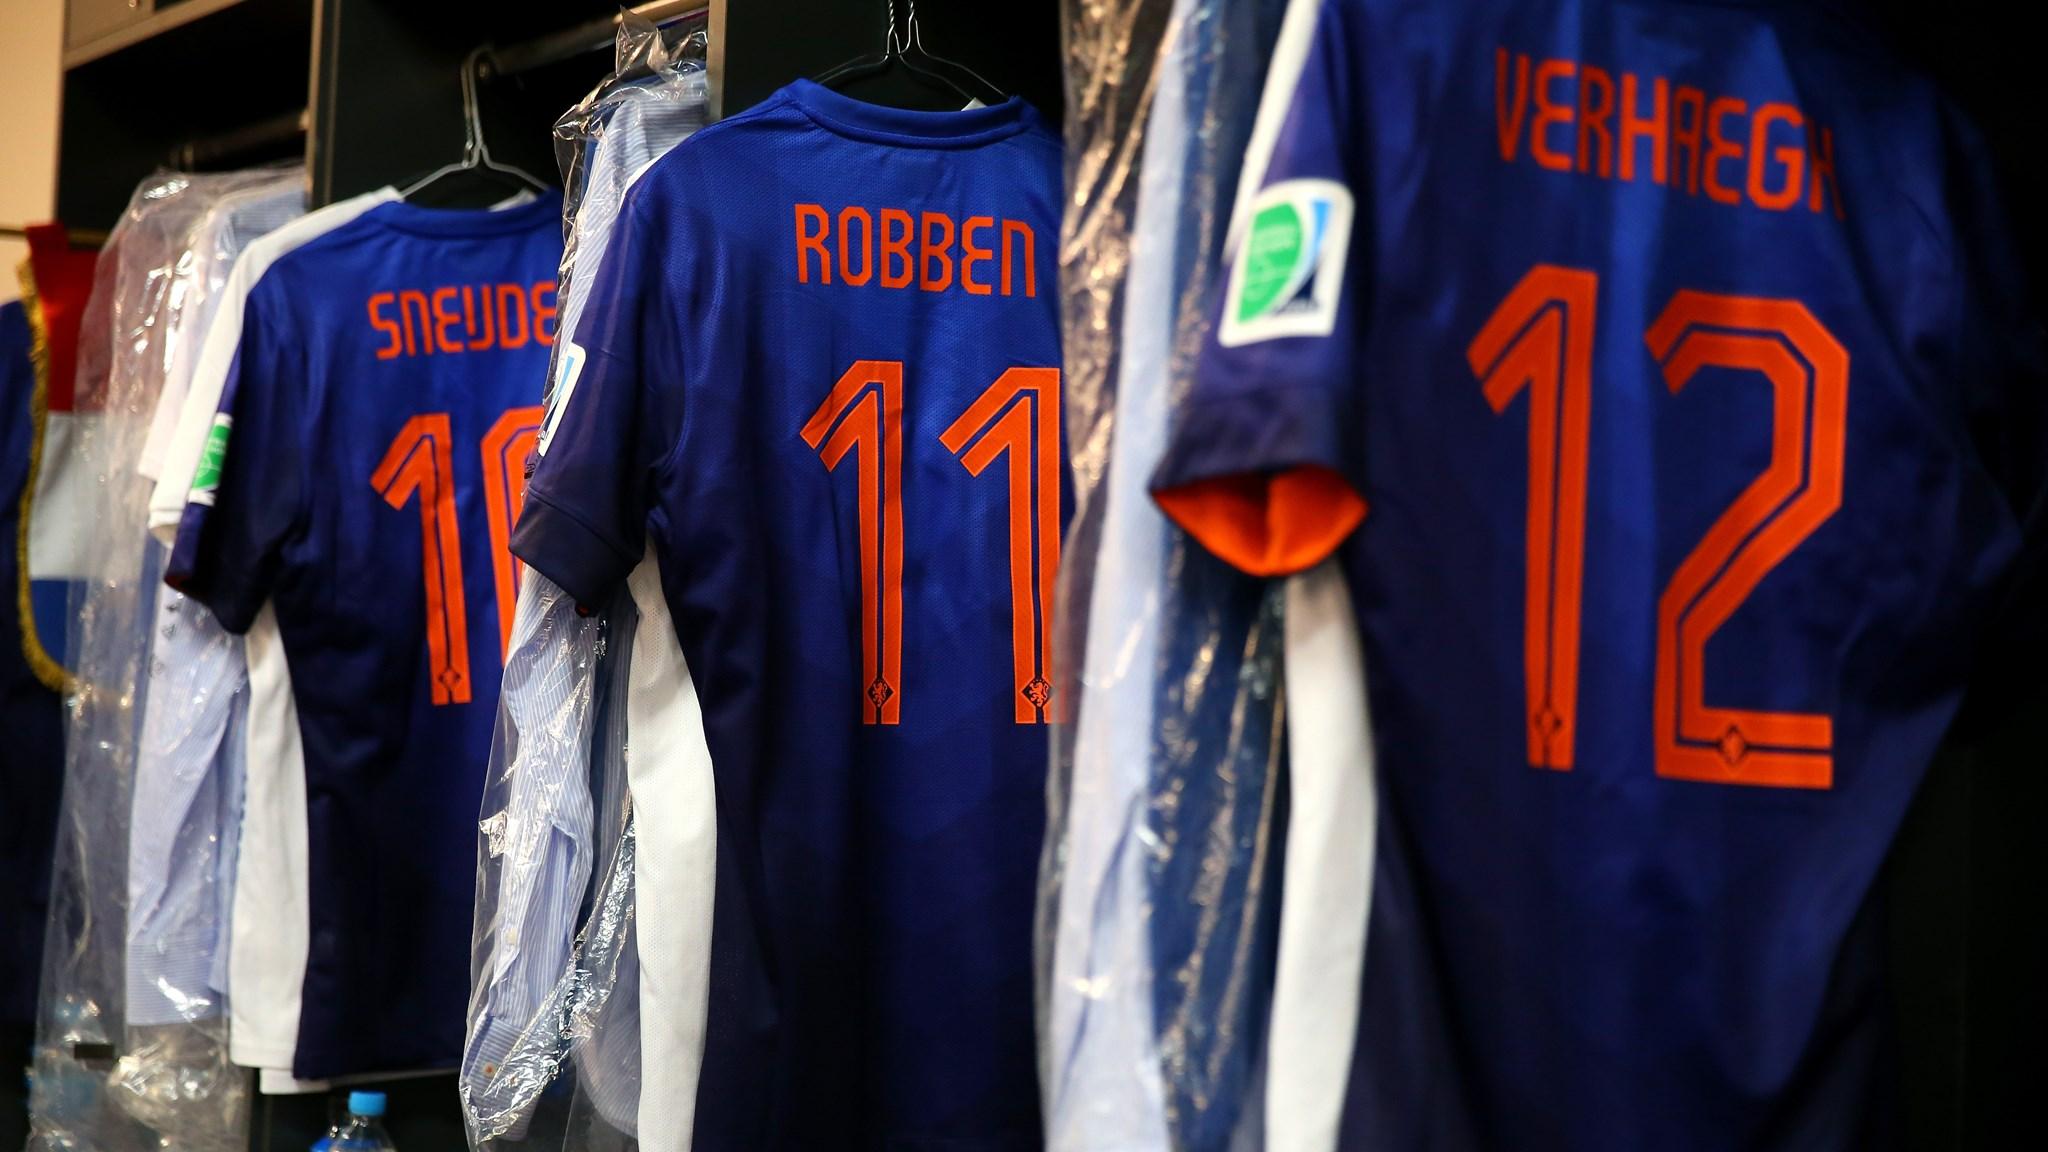 201 - Brazil-Netherlands [0-3] -- 12 Jul 2014 - 17-00 - kuaza